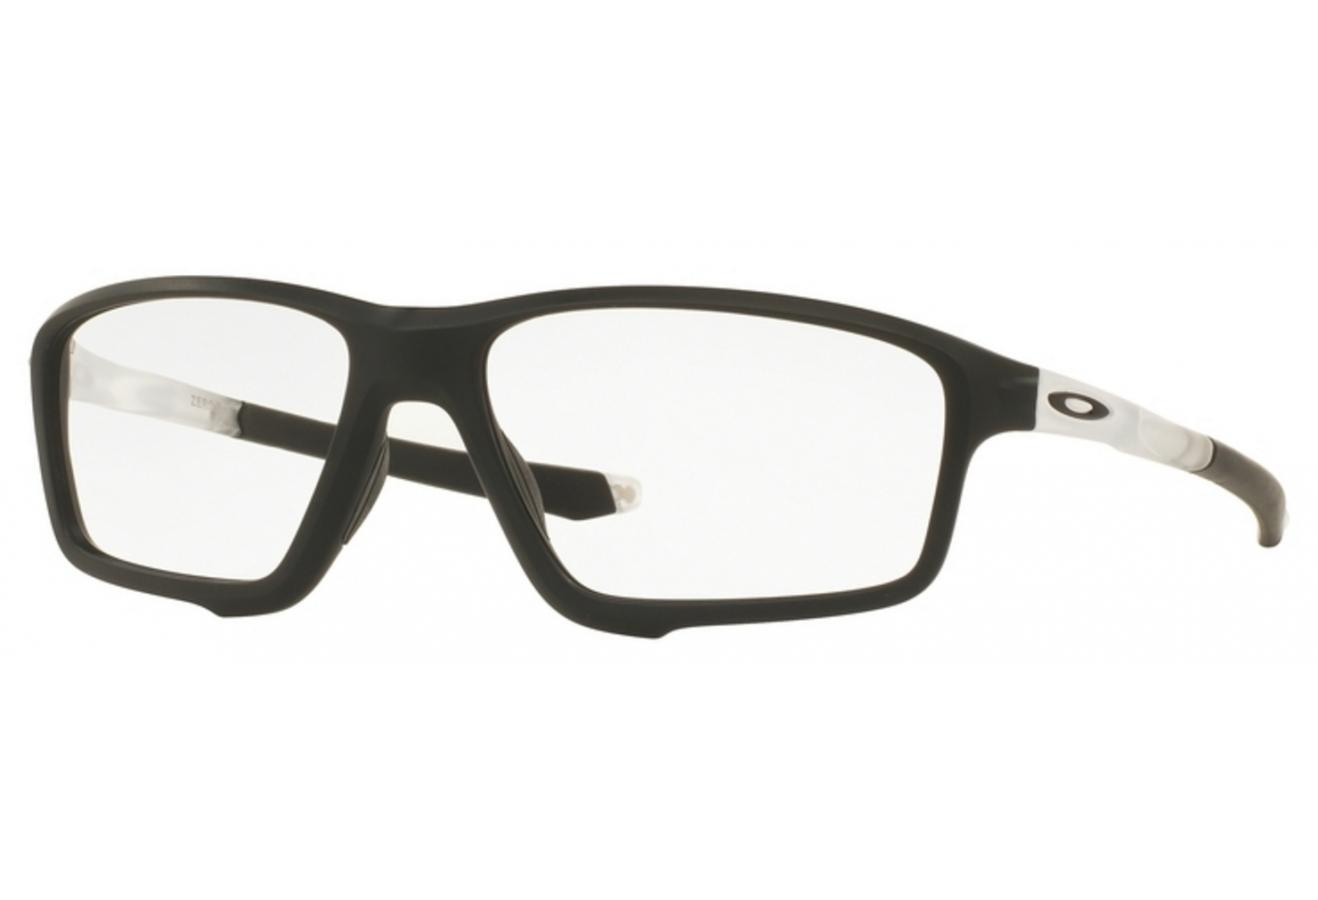 lunette oakley noir mat